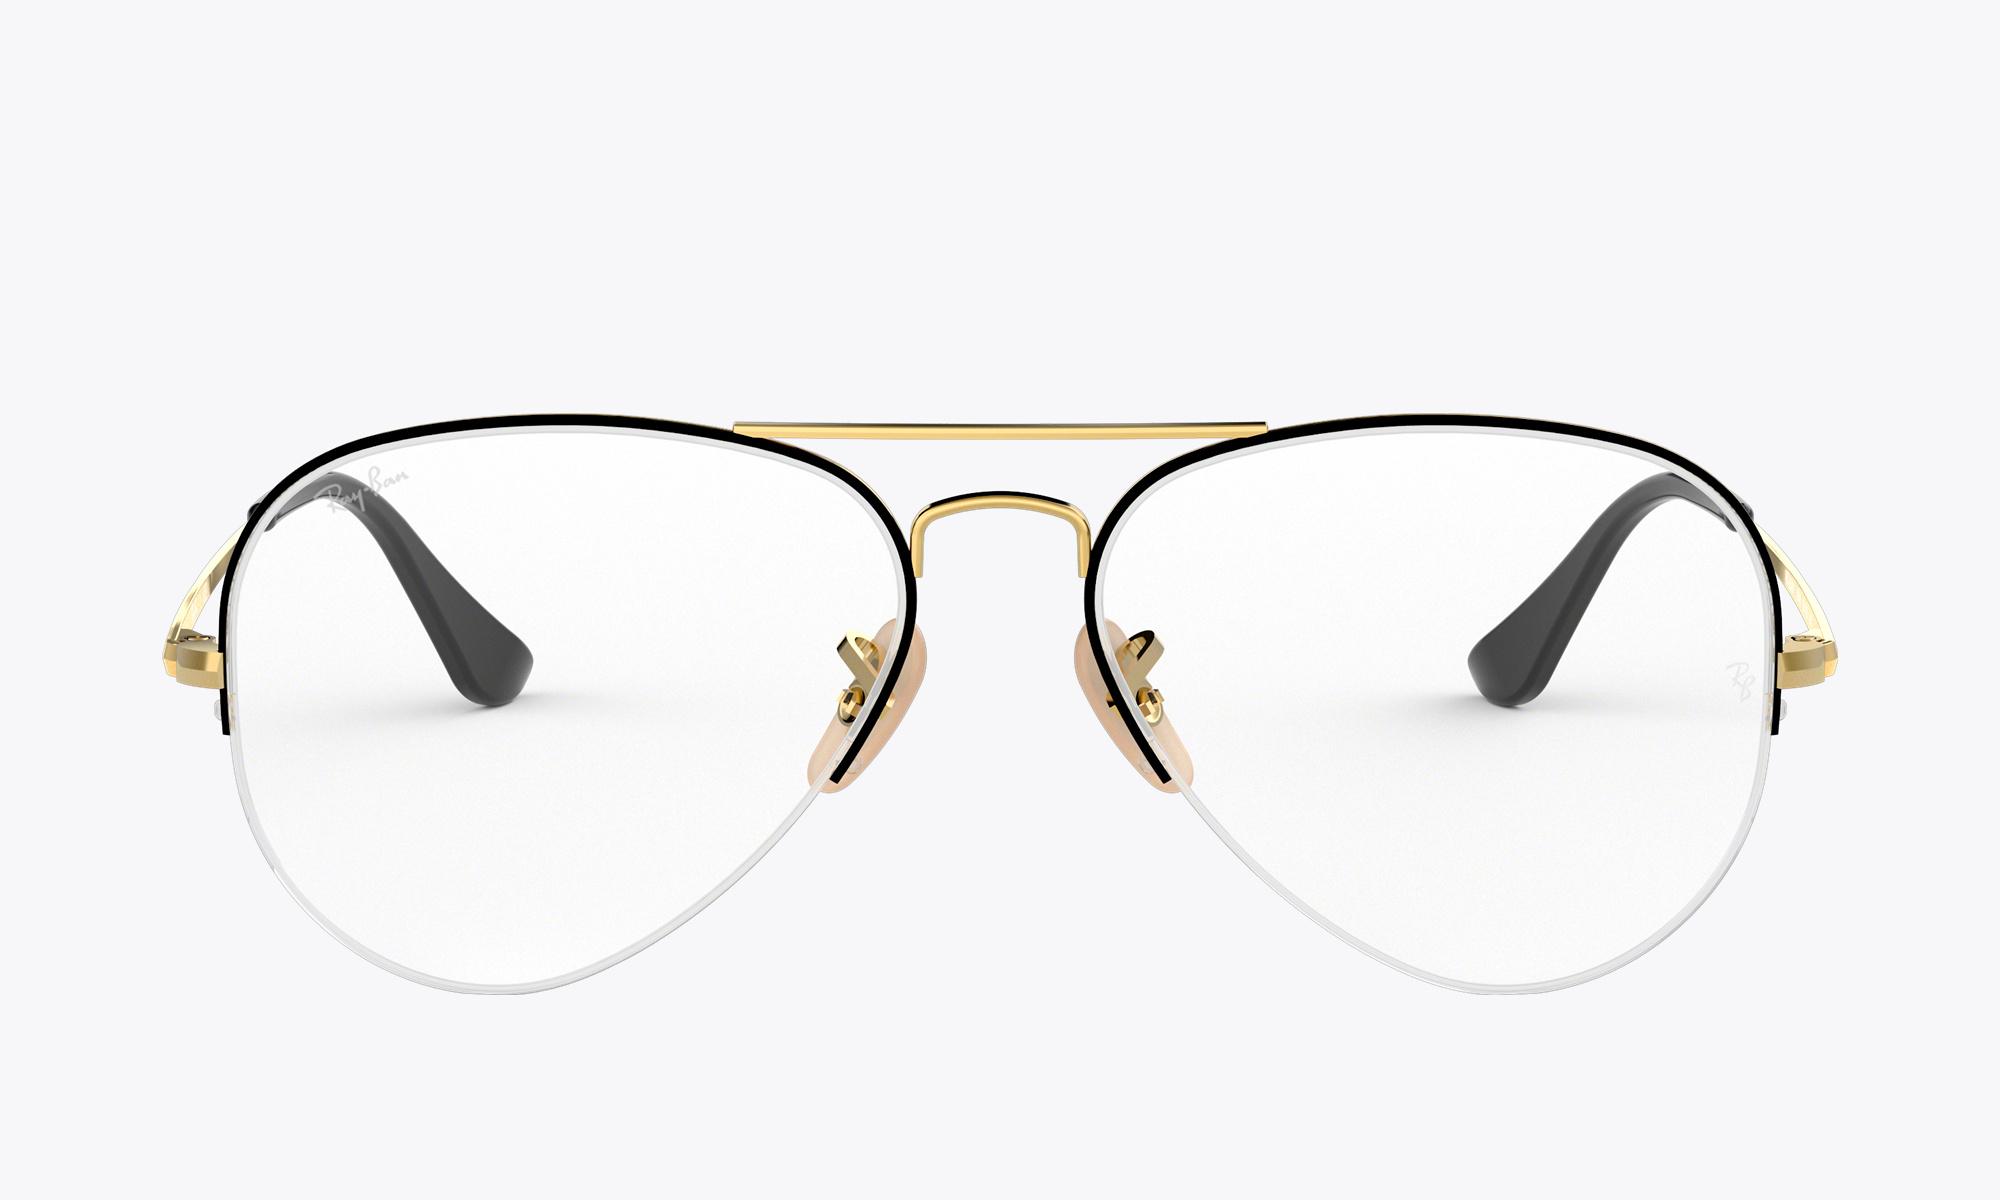 bcf6b828b Ray-Ban Aviator Gaze | Glasses.com® | Free Shipping